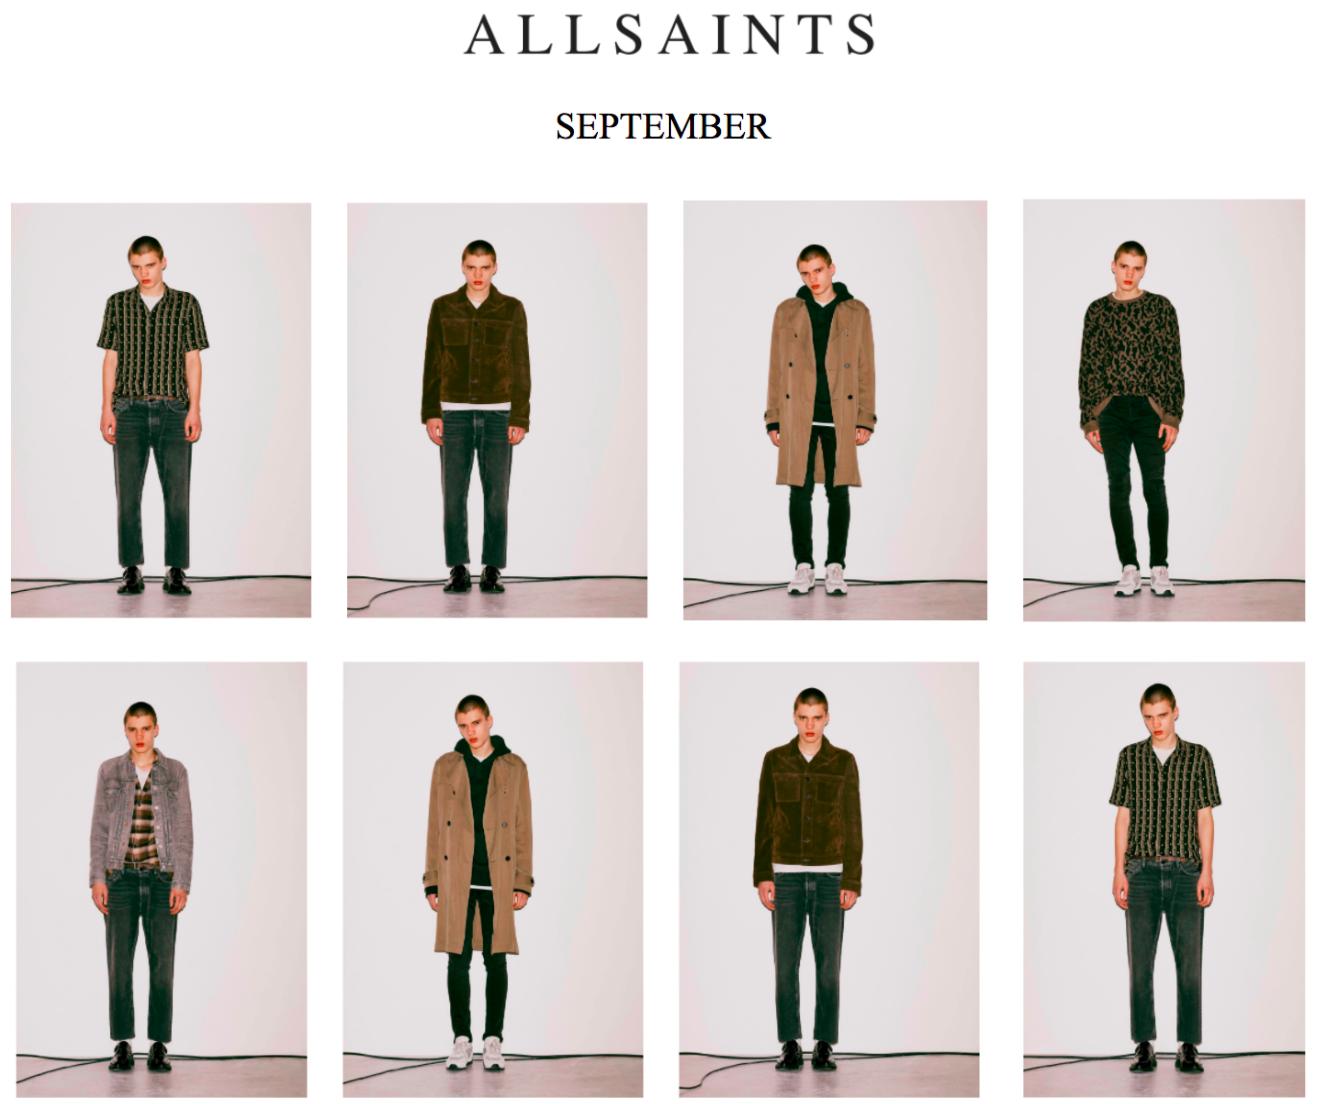 All Saints Release September/October Lookbook